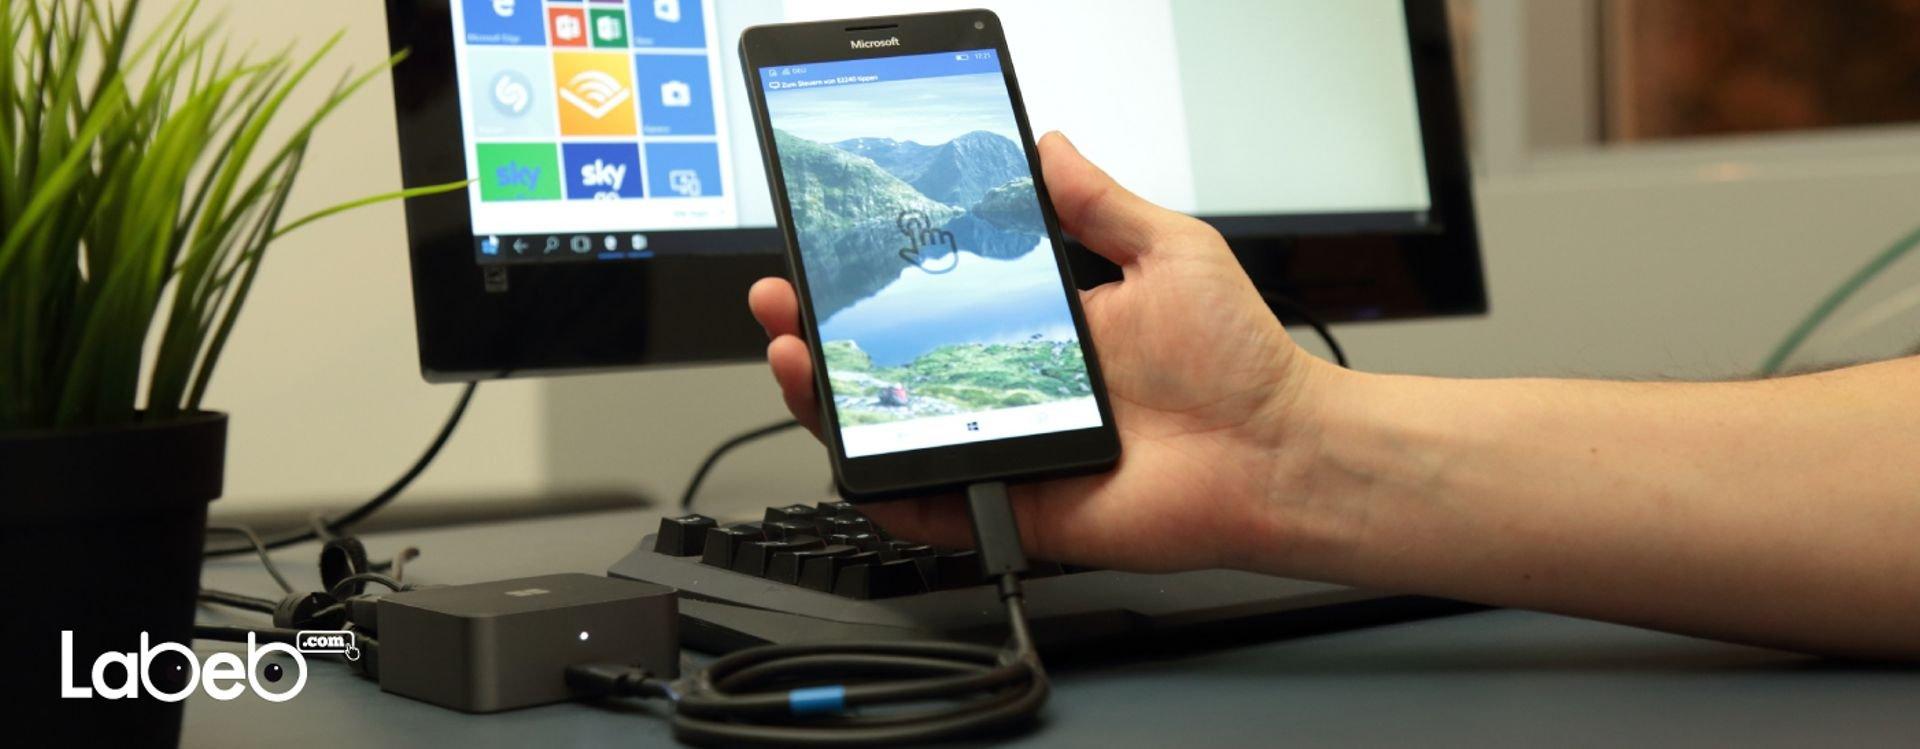 Microsoft Lumia 950 XL Smartphones have a big 5.7 Inch Screen.